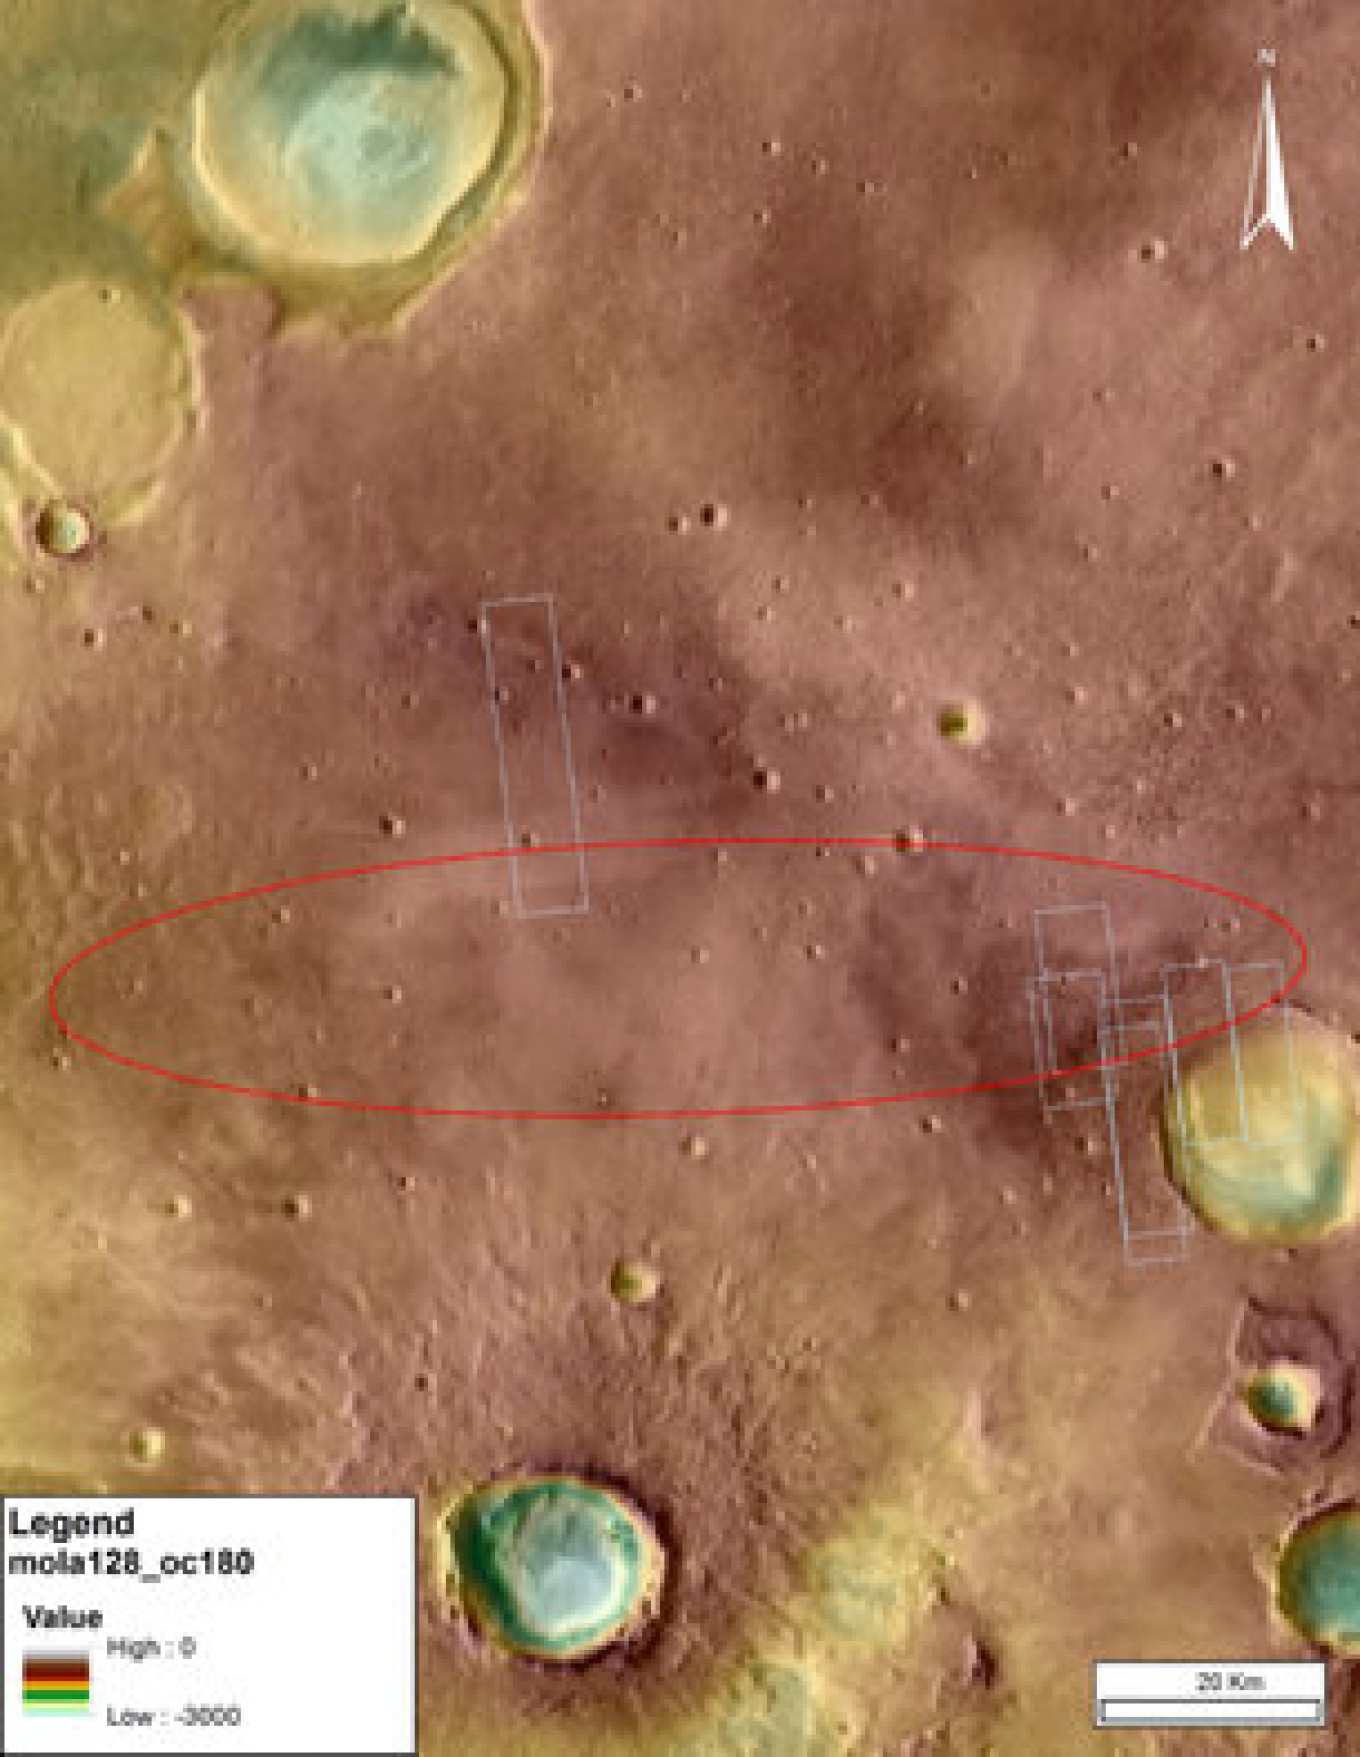 Map of Schiaparelli's designated landing zone European Space Agency